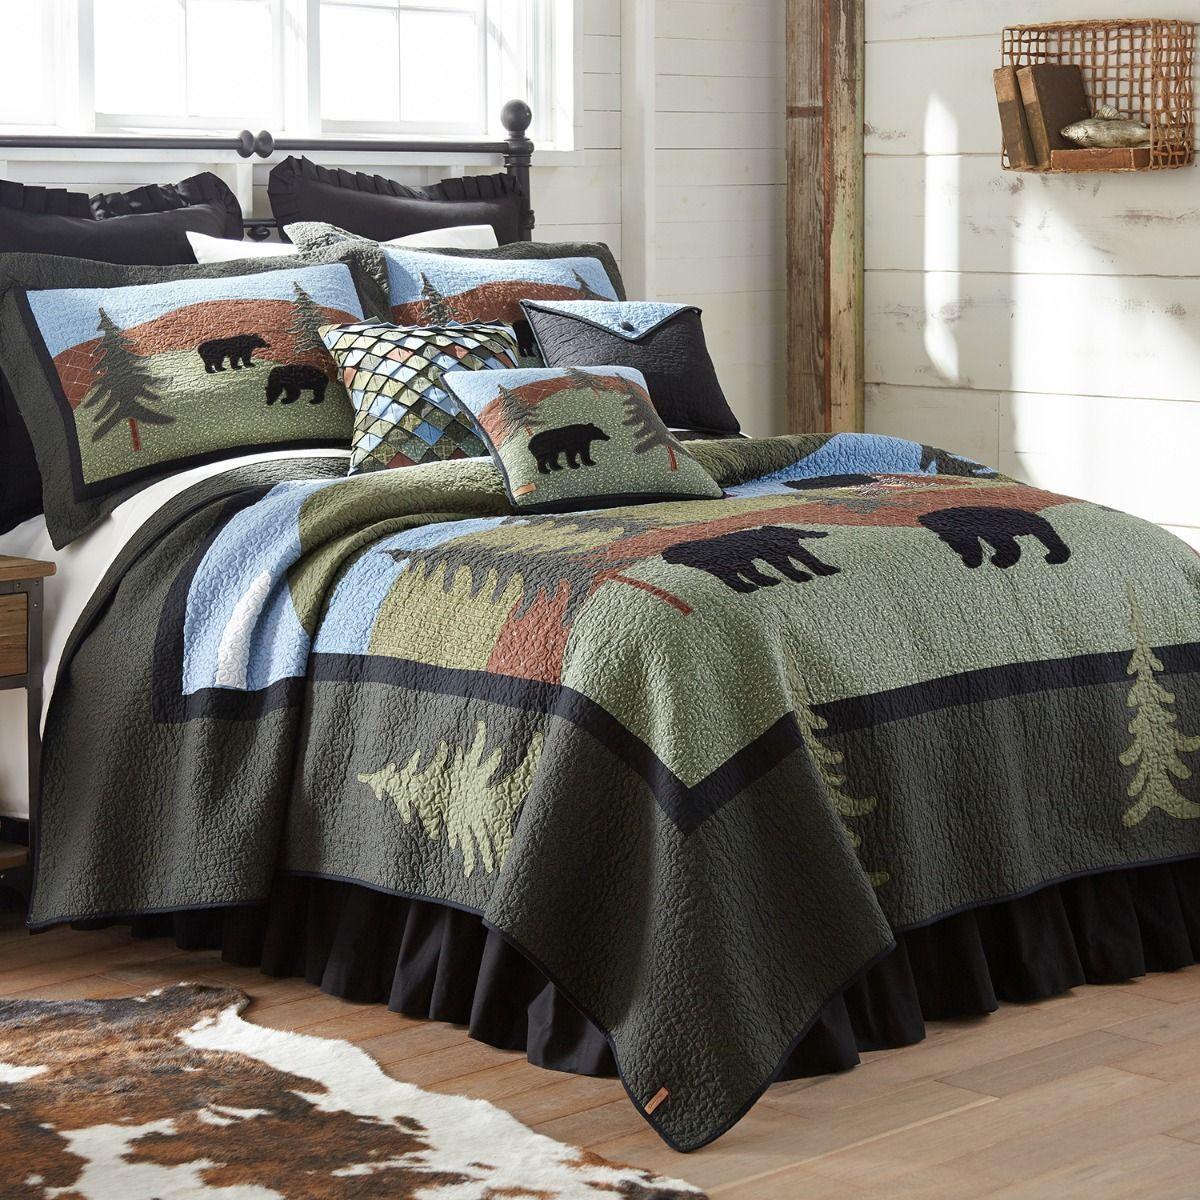 damen Sharp Bear Lake Quilted Country Cotton King 4-Piece Bedding Set